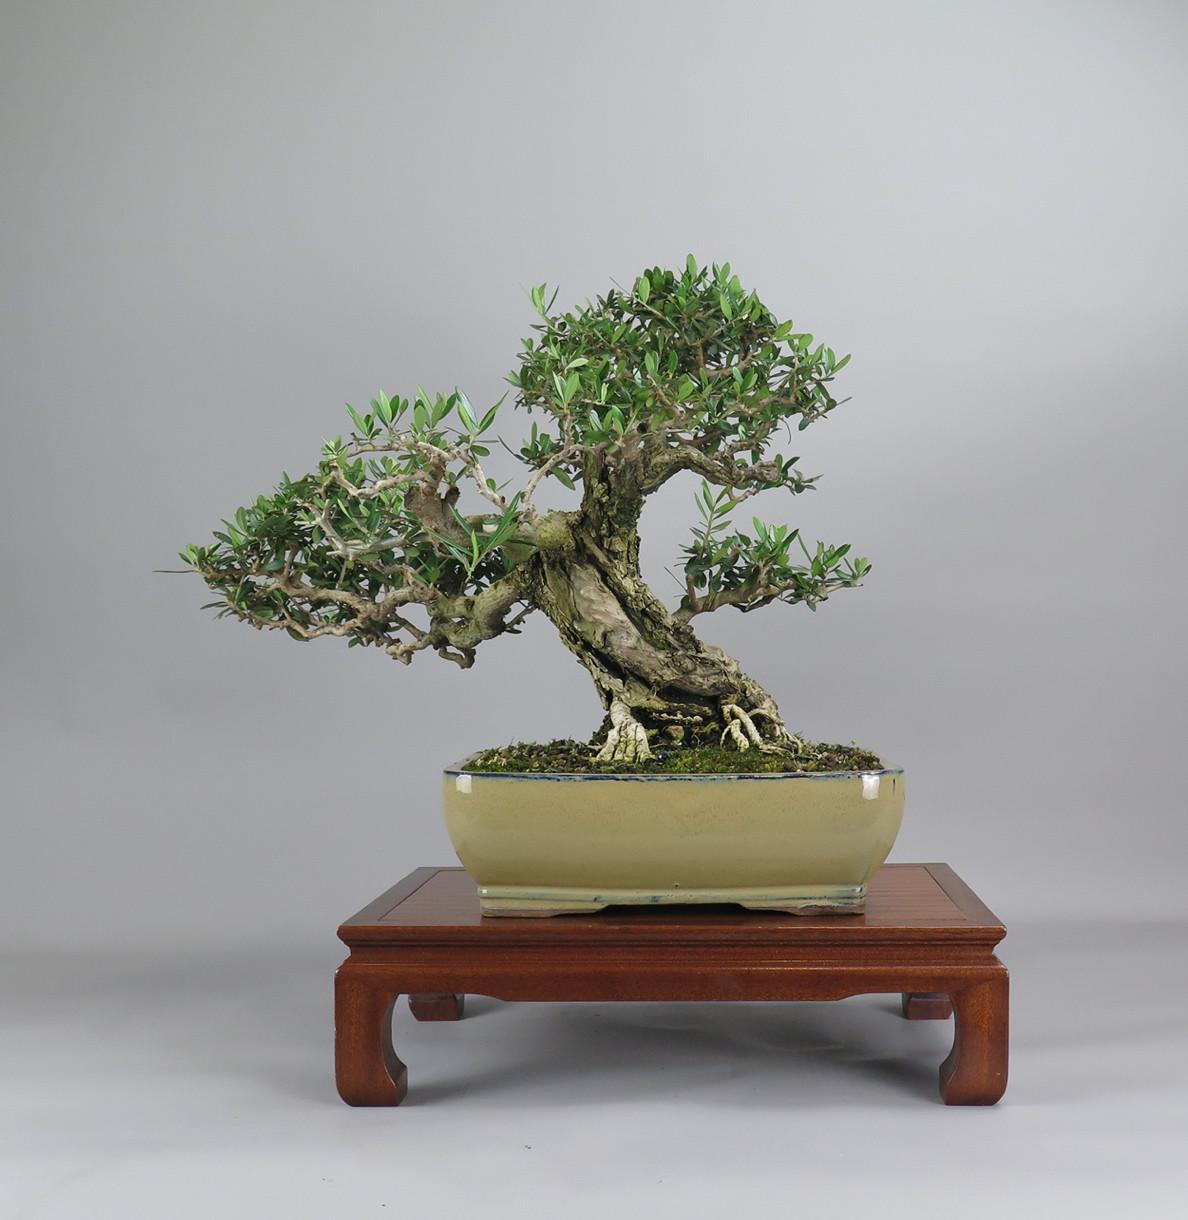 bonsa de olivo, espalda